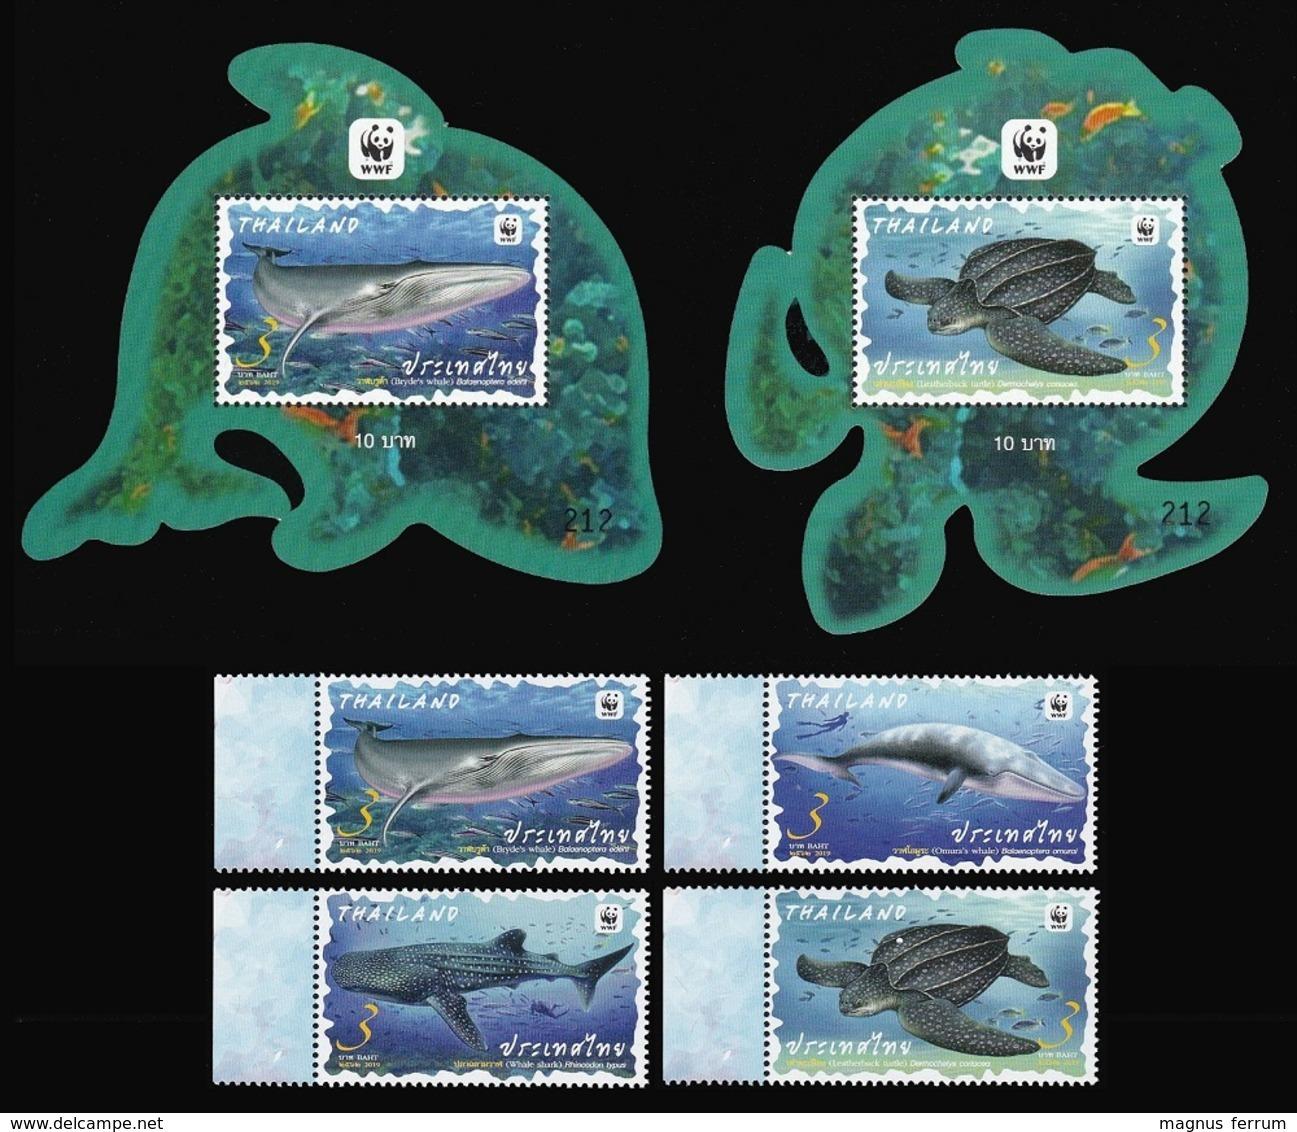 2019 Thailand, Marine Fauna, Whales, Shark, Turtle, WWF, 2 Sheets+4 Stamps - W.W.F.